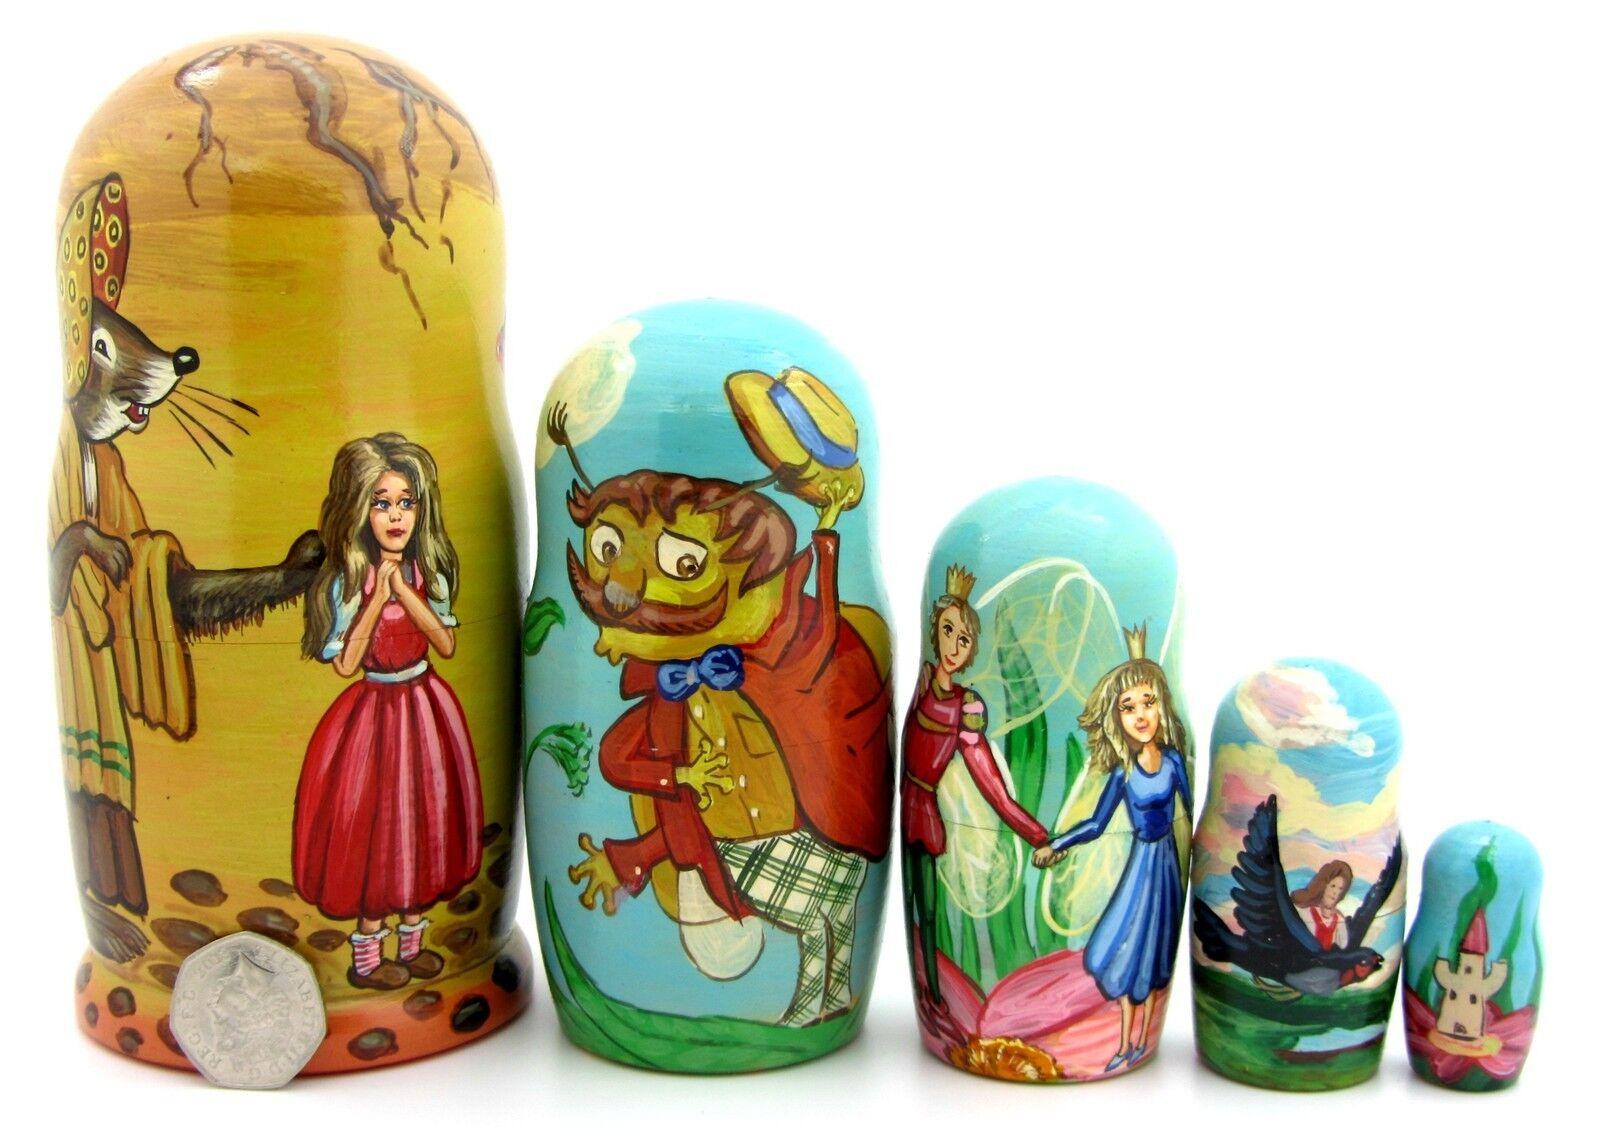 Russian nesting 5 dolls Matryoshka Thumbelina Mole Mouse  Andersen Fairy tale